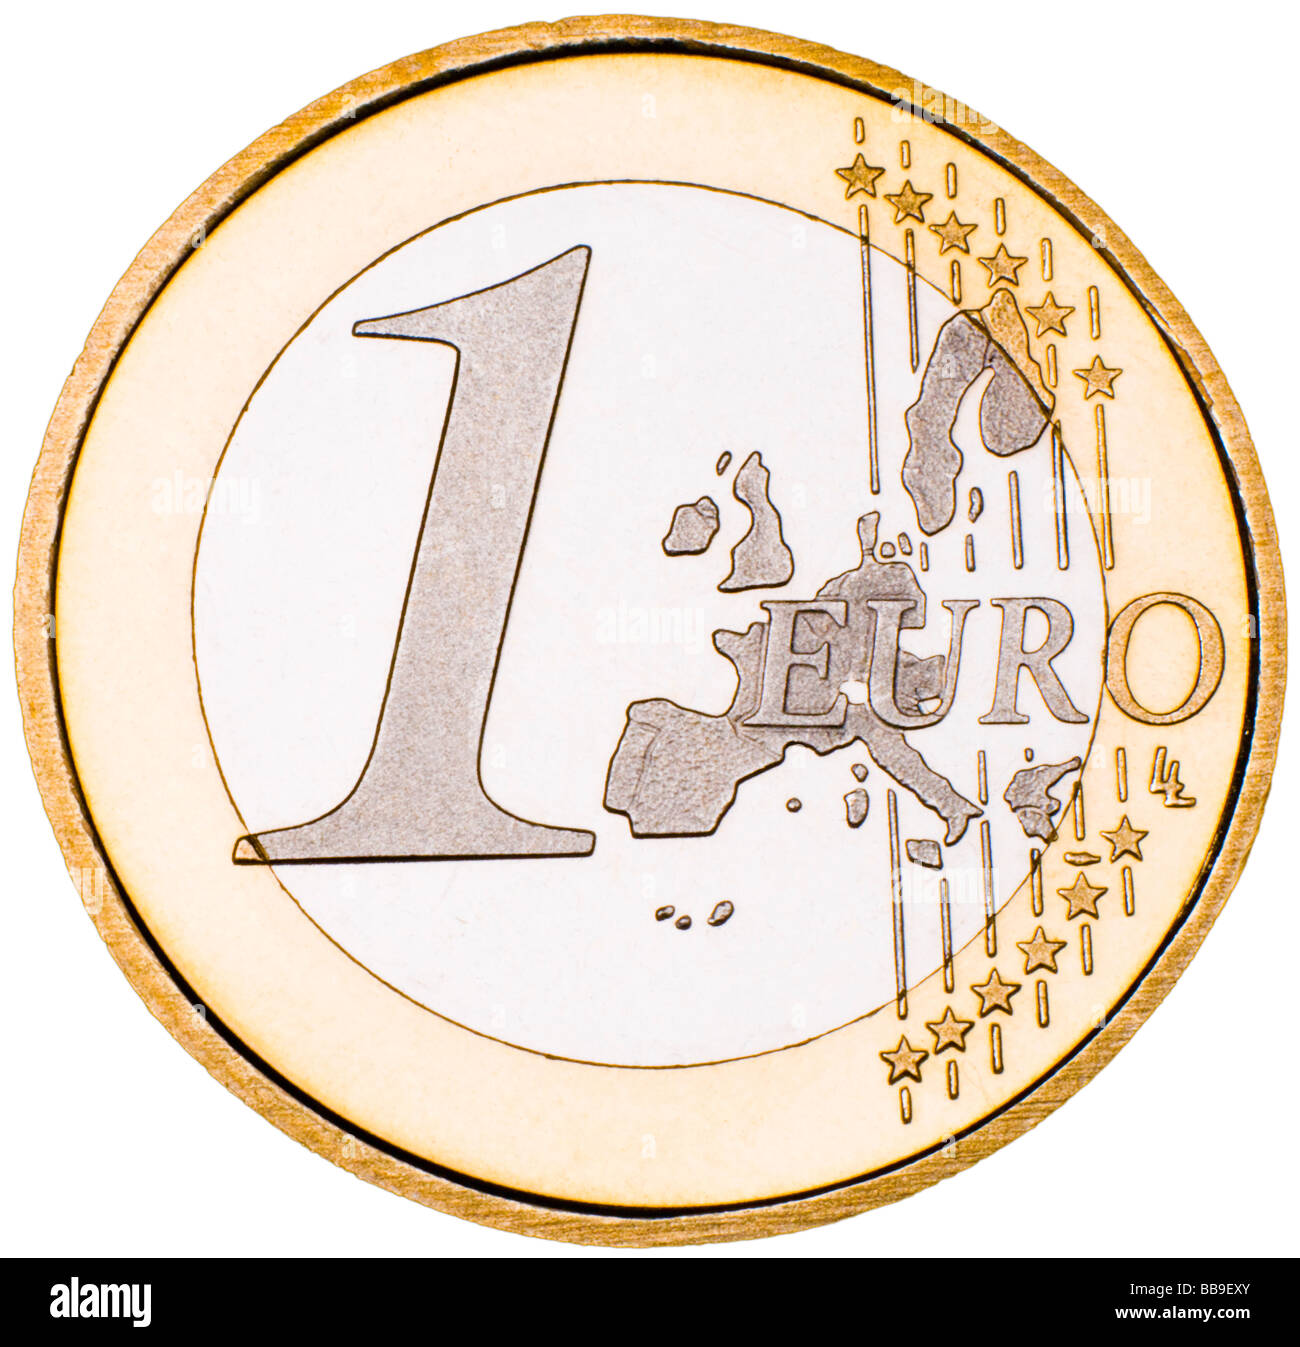 1 Euro Coin obverse - Stock Image